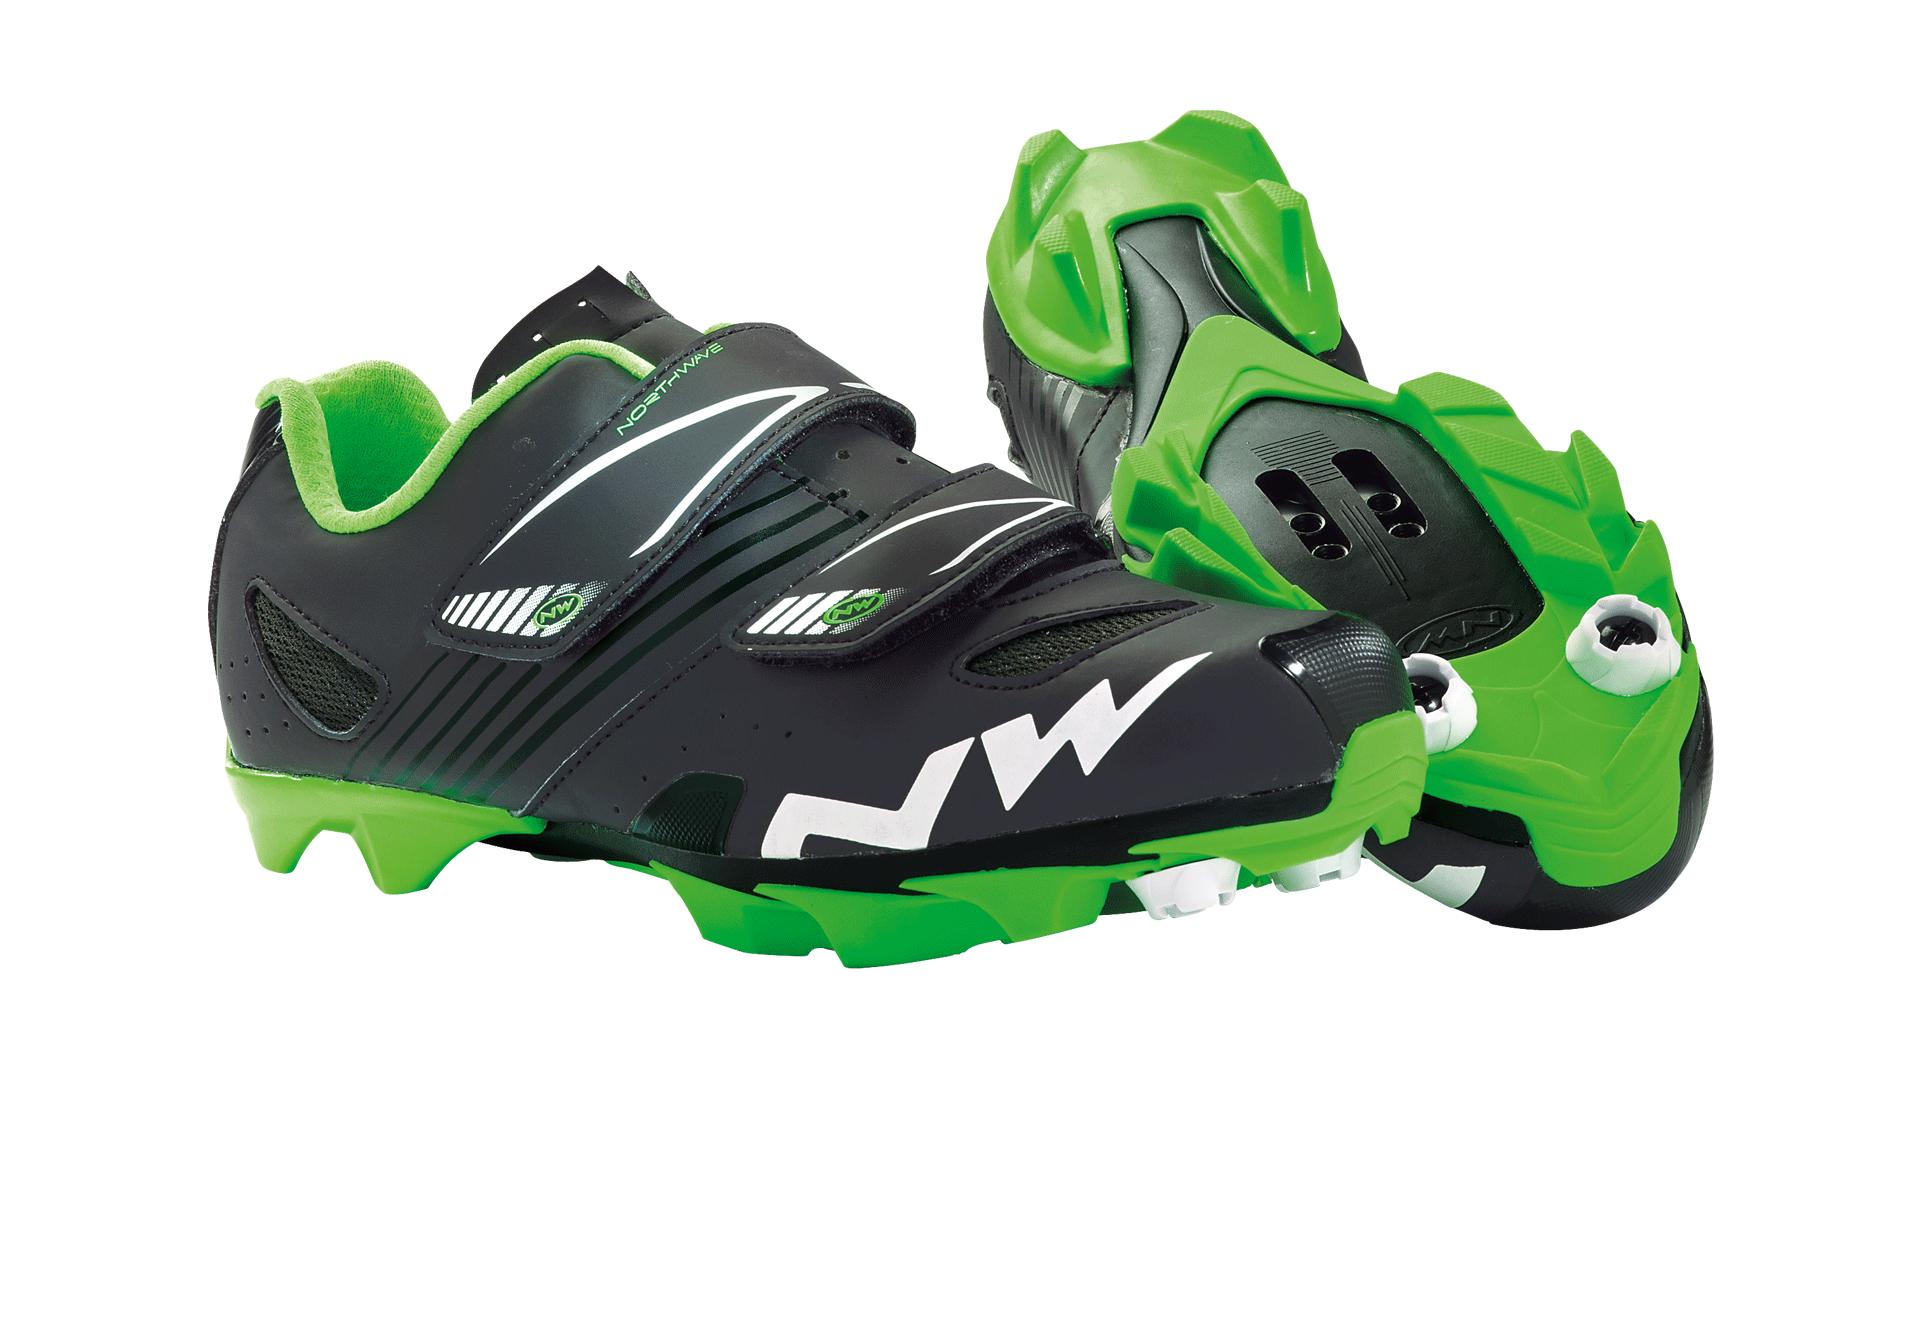 Chaussures Northwave Hammer Junior Noir mat/Vert - 32